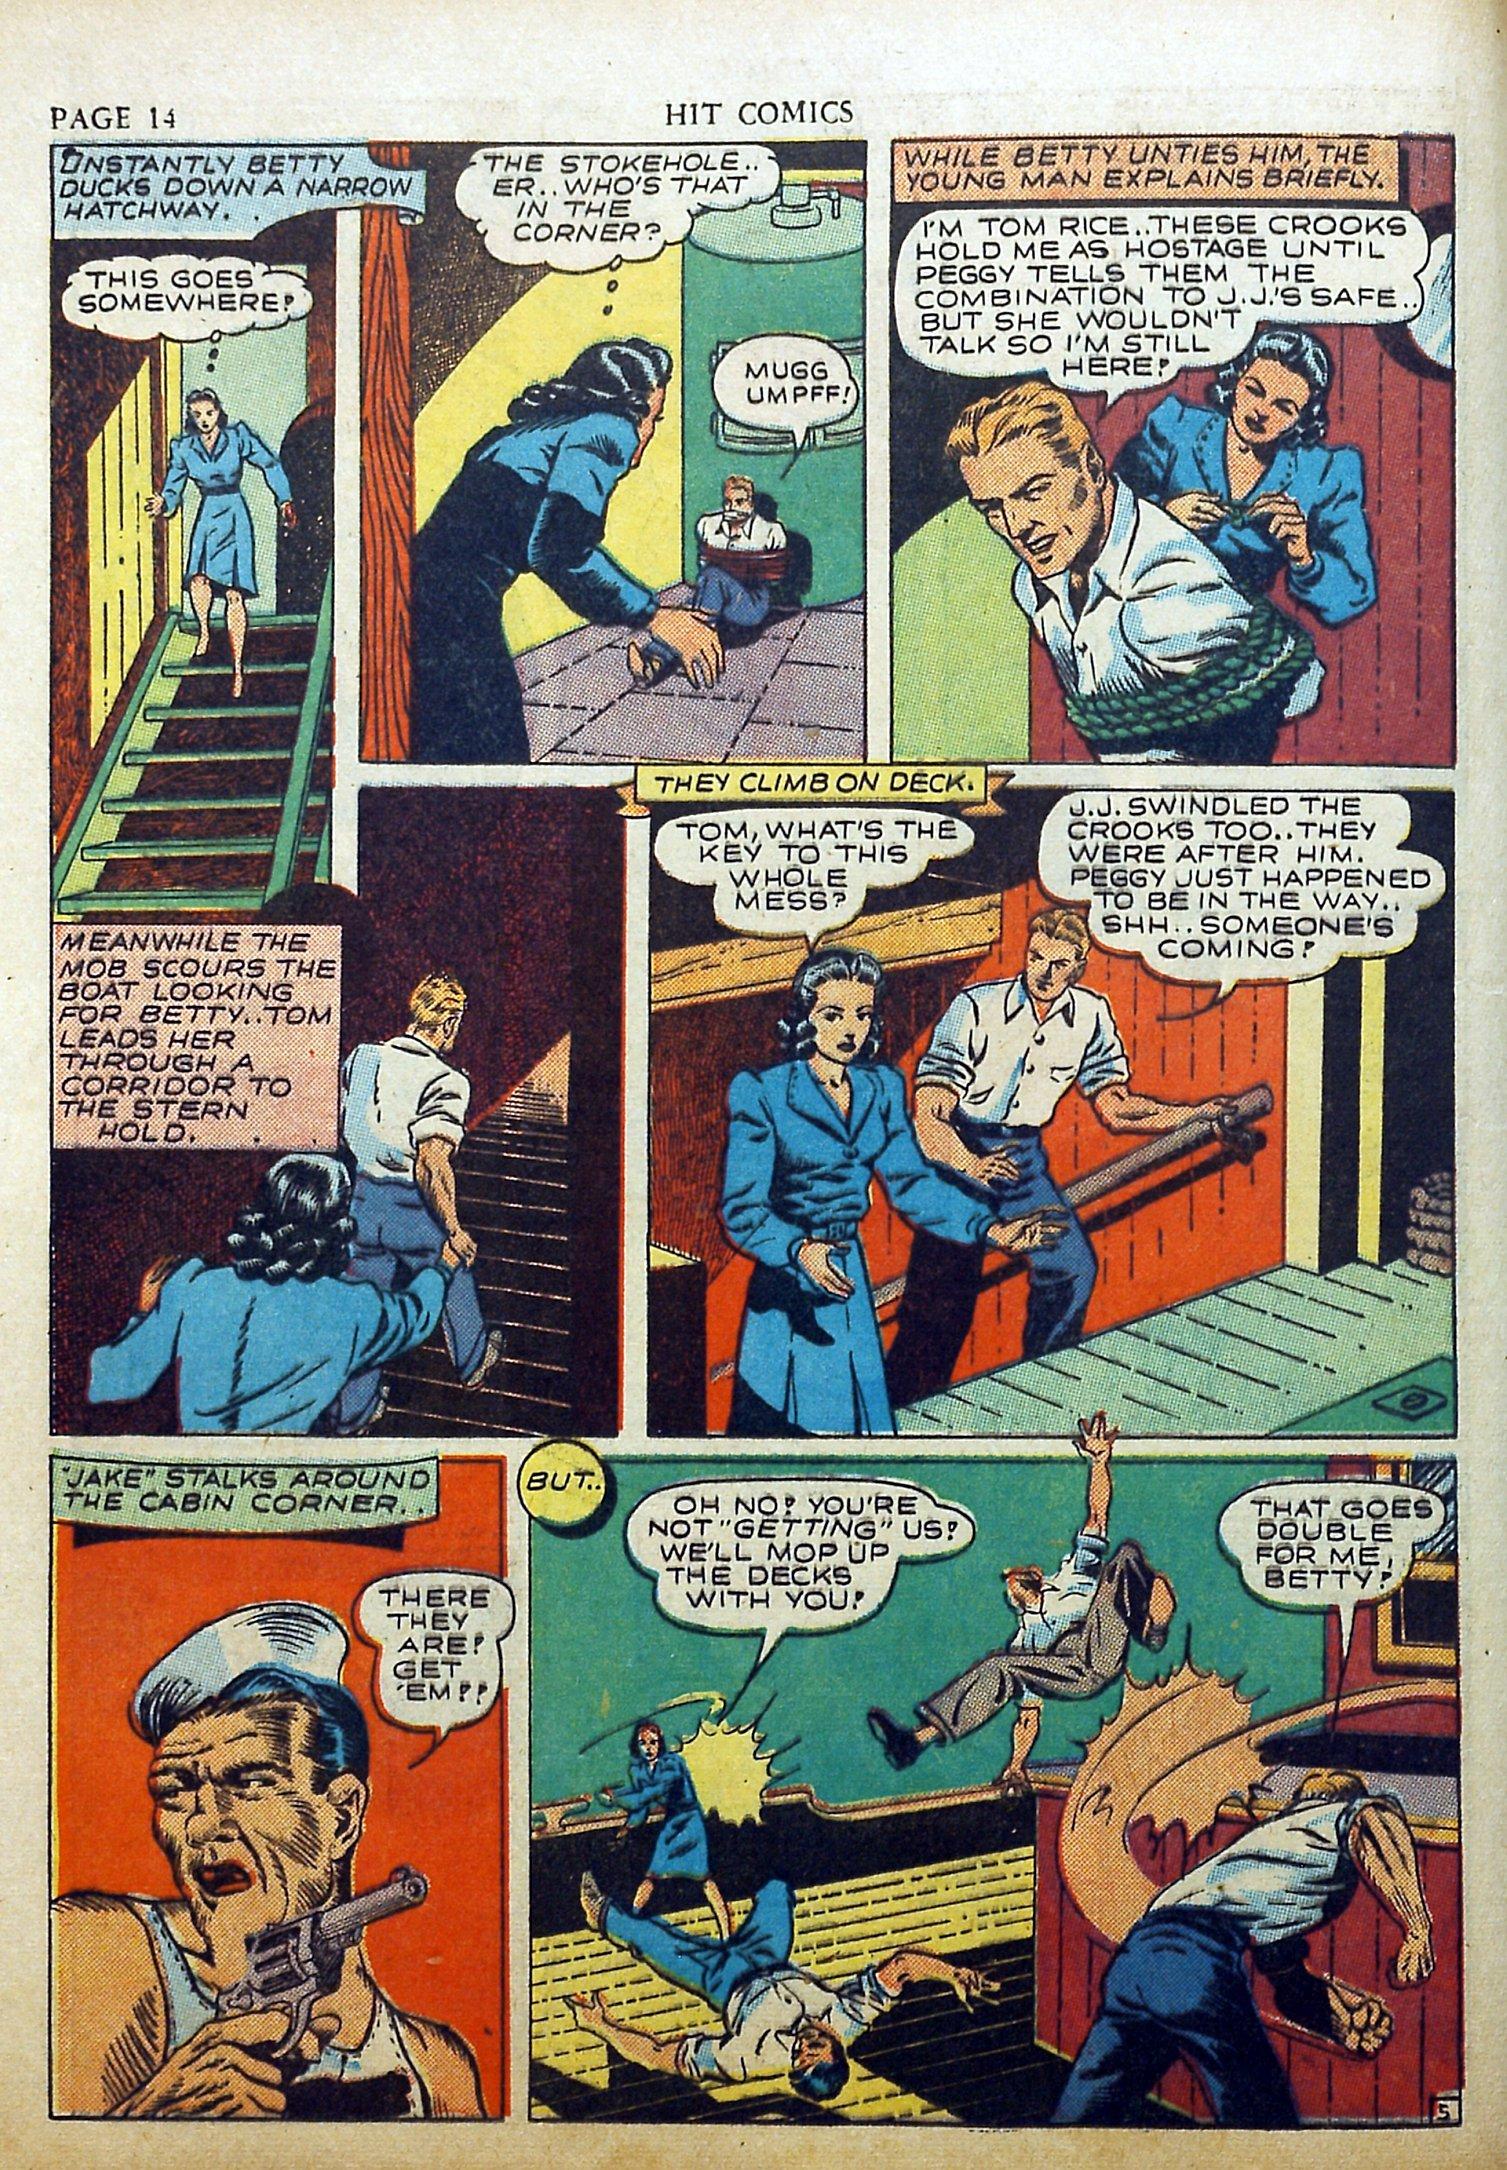 Read online Hit Comics comic -  Issue #17 - 16